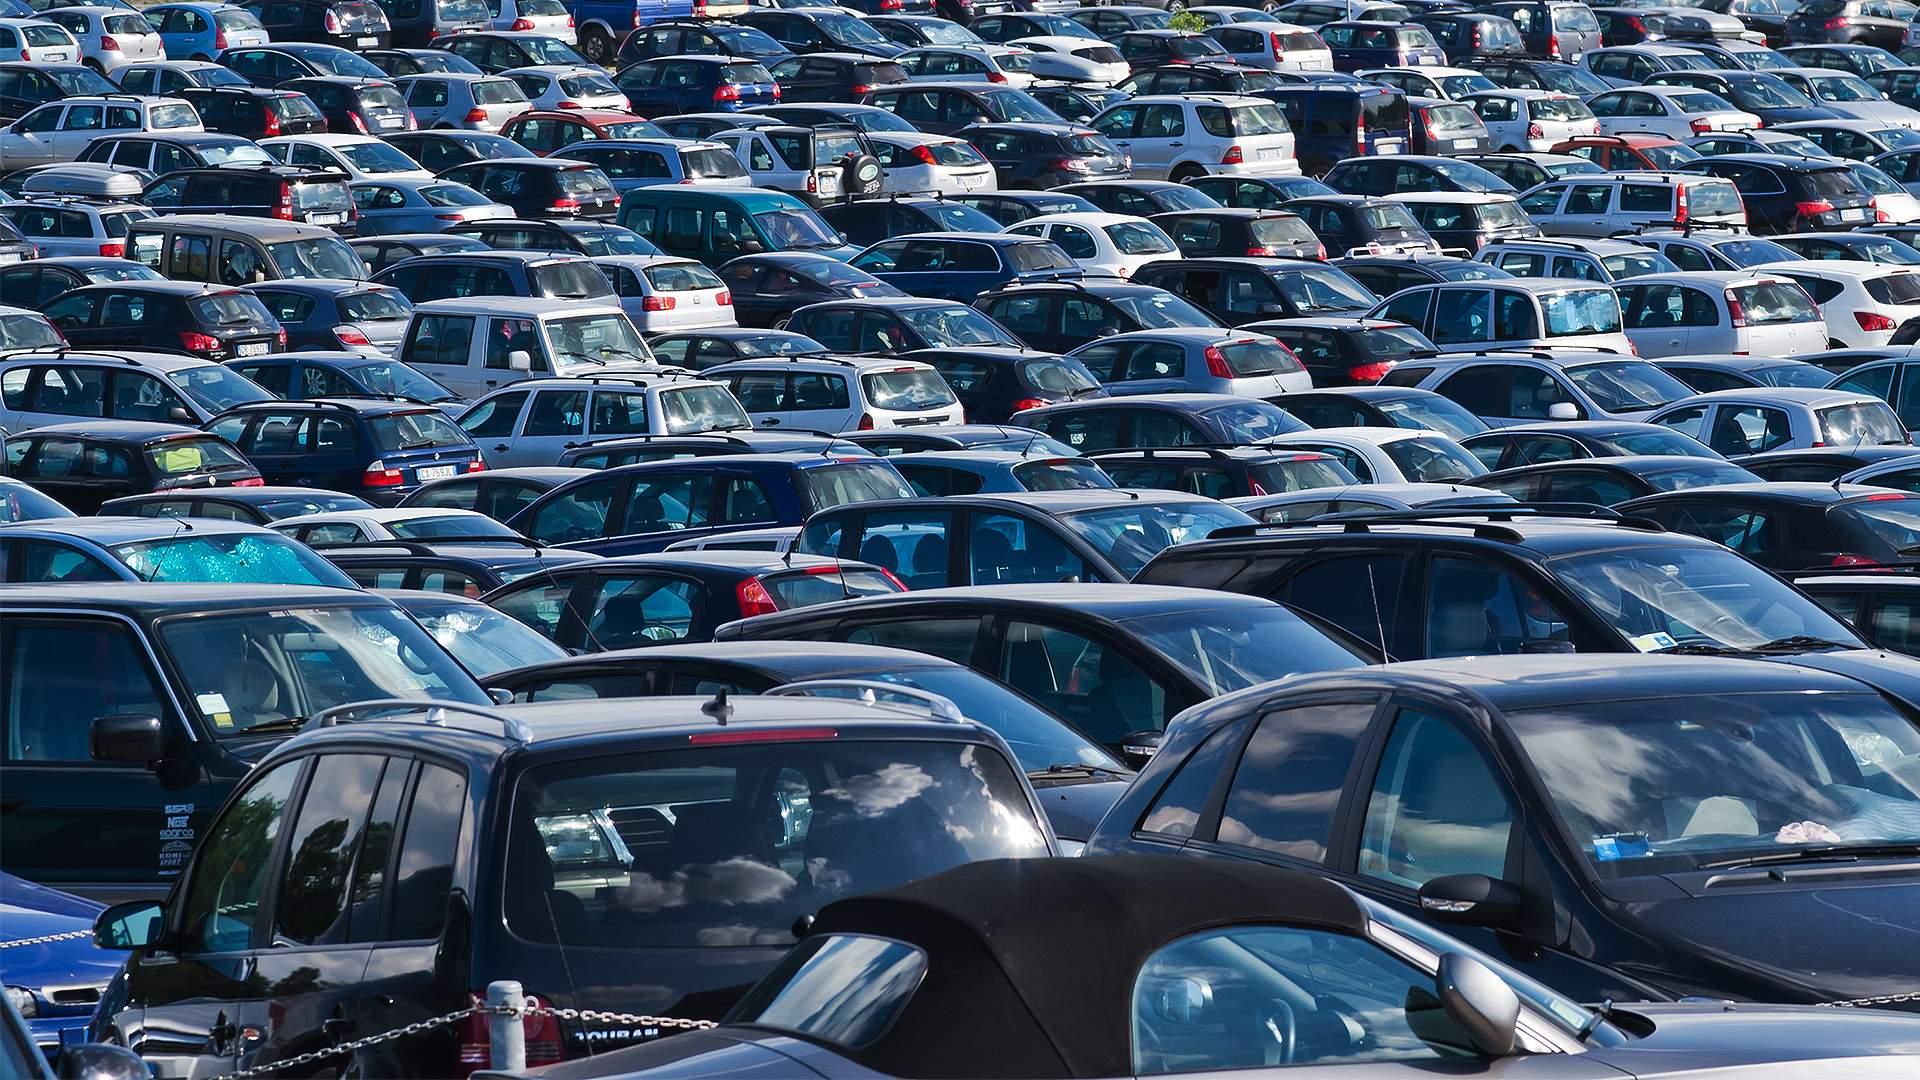 продажа авто в ломбарде